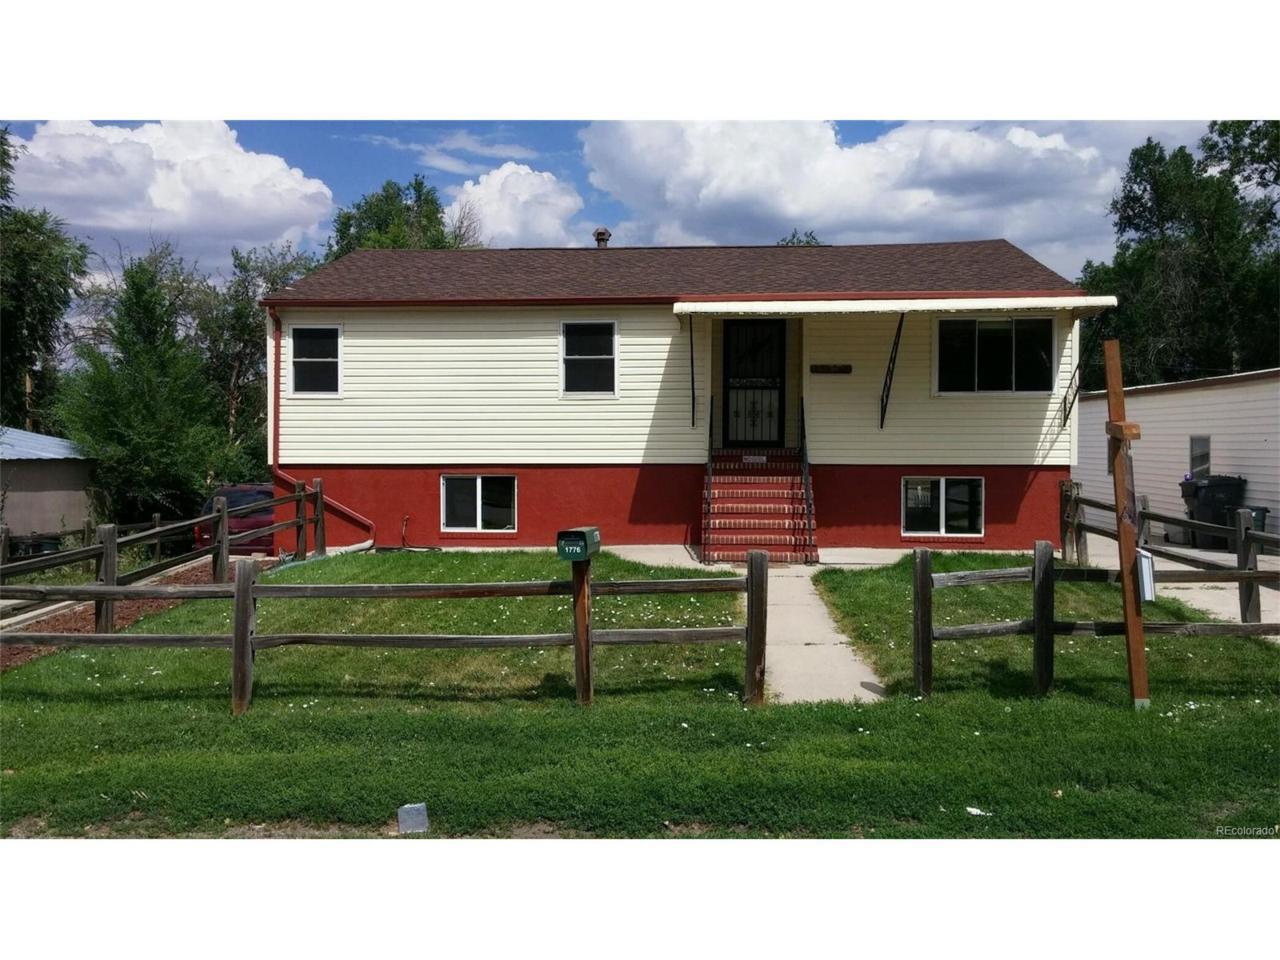 1776 Jay Street, Lakewood, CO 80214 (MLS #3556797) :: 8z Real Estate